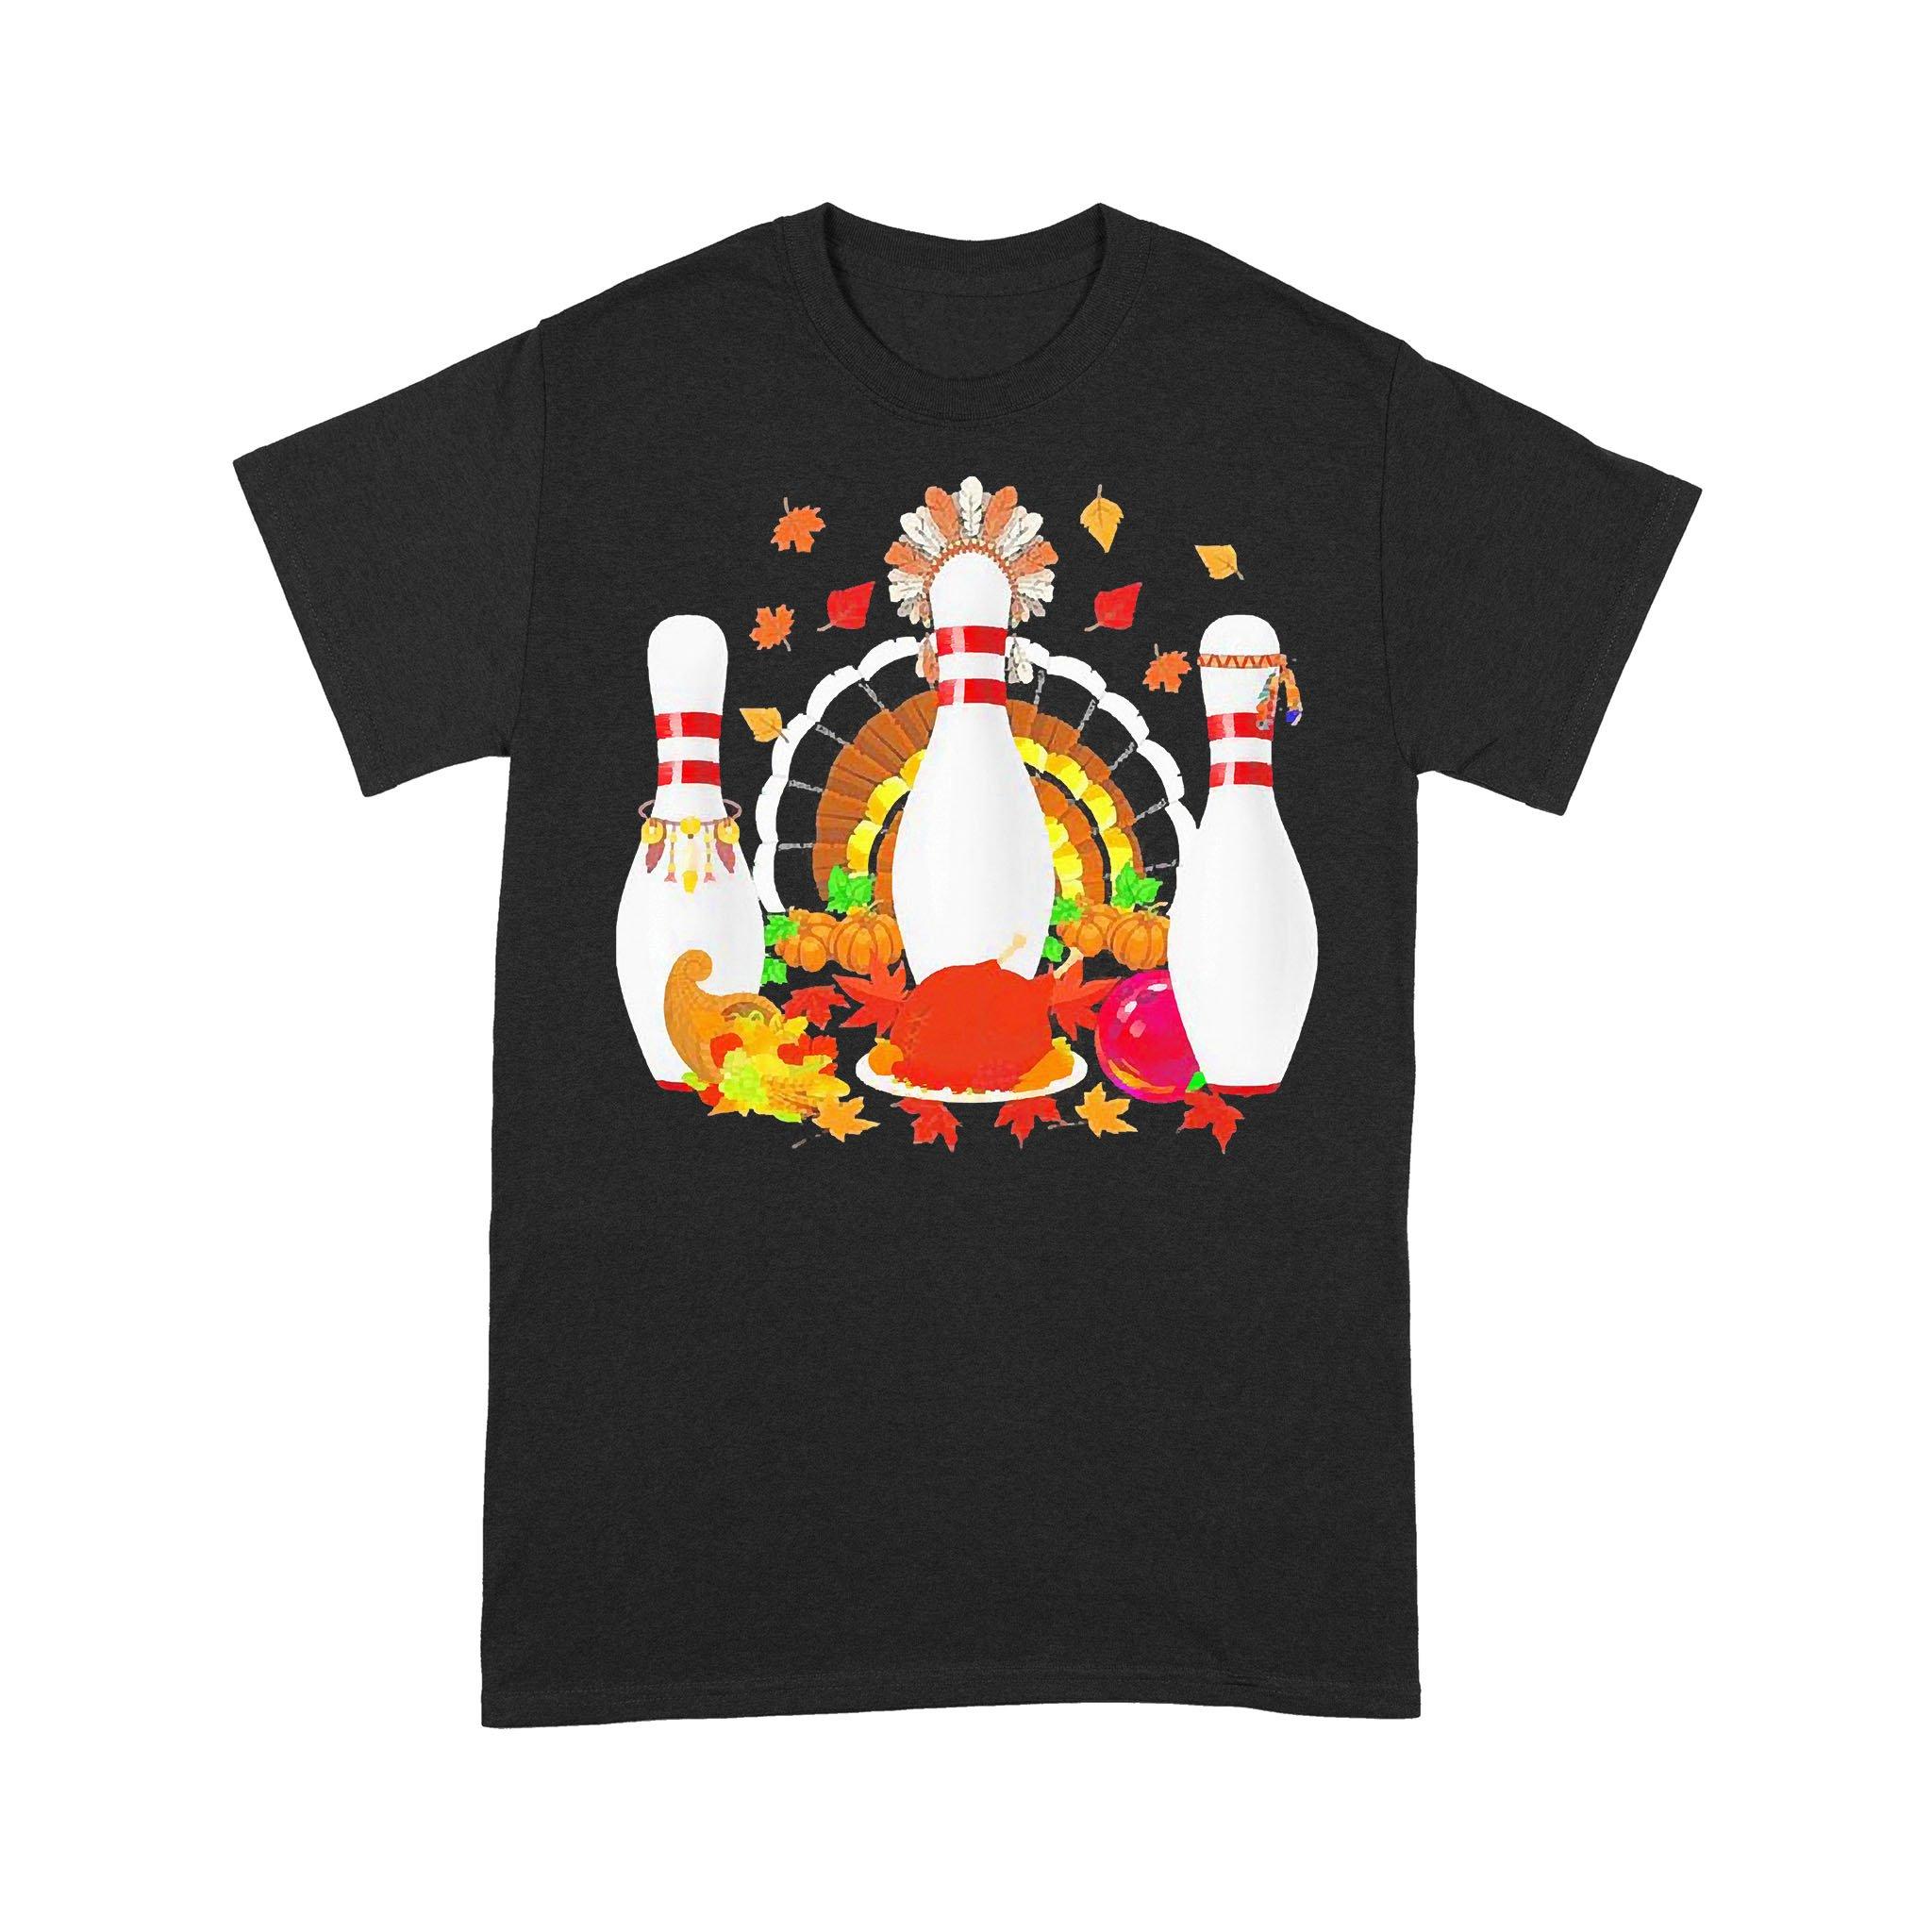 Bowling Native American Thanksgiving T-shirt